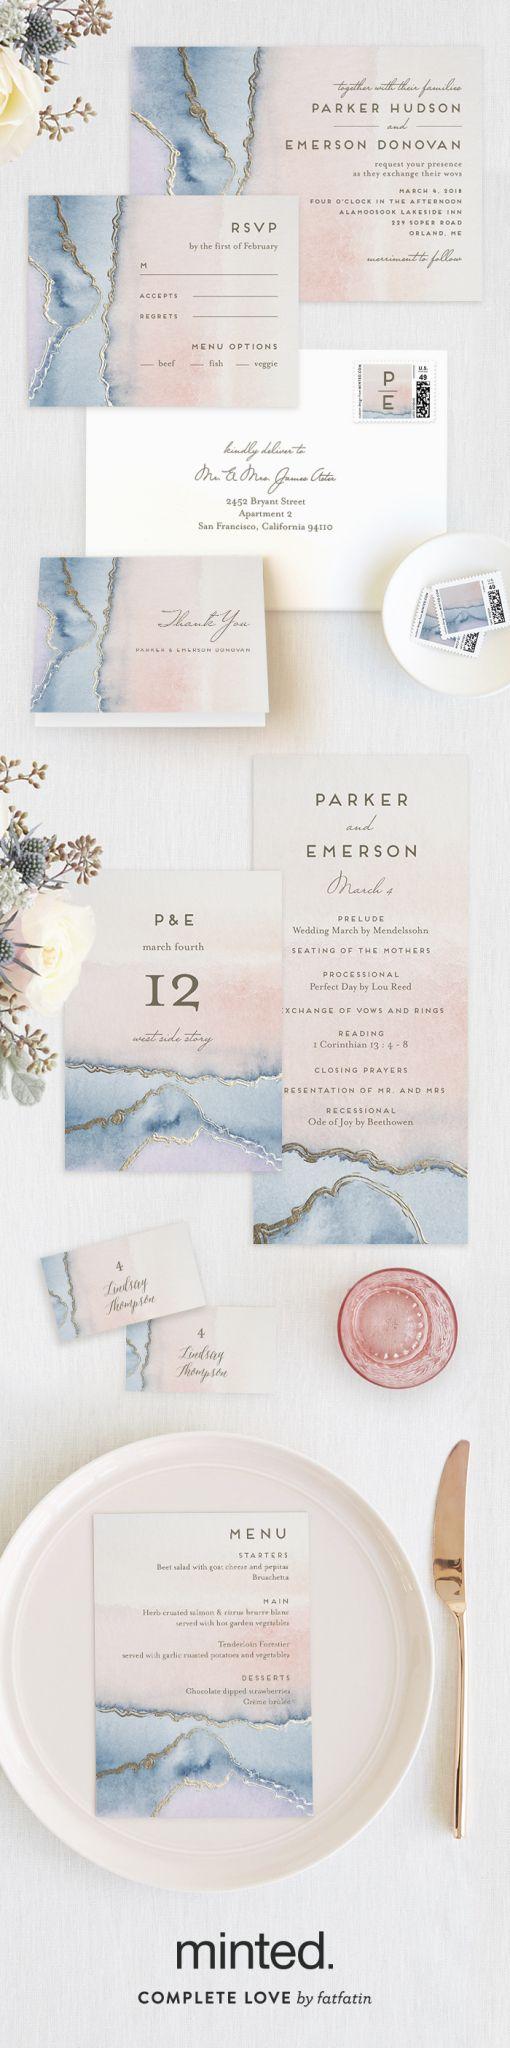 141 best wedding invitations images on pinterest bridal